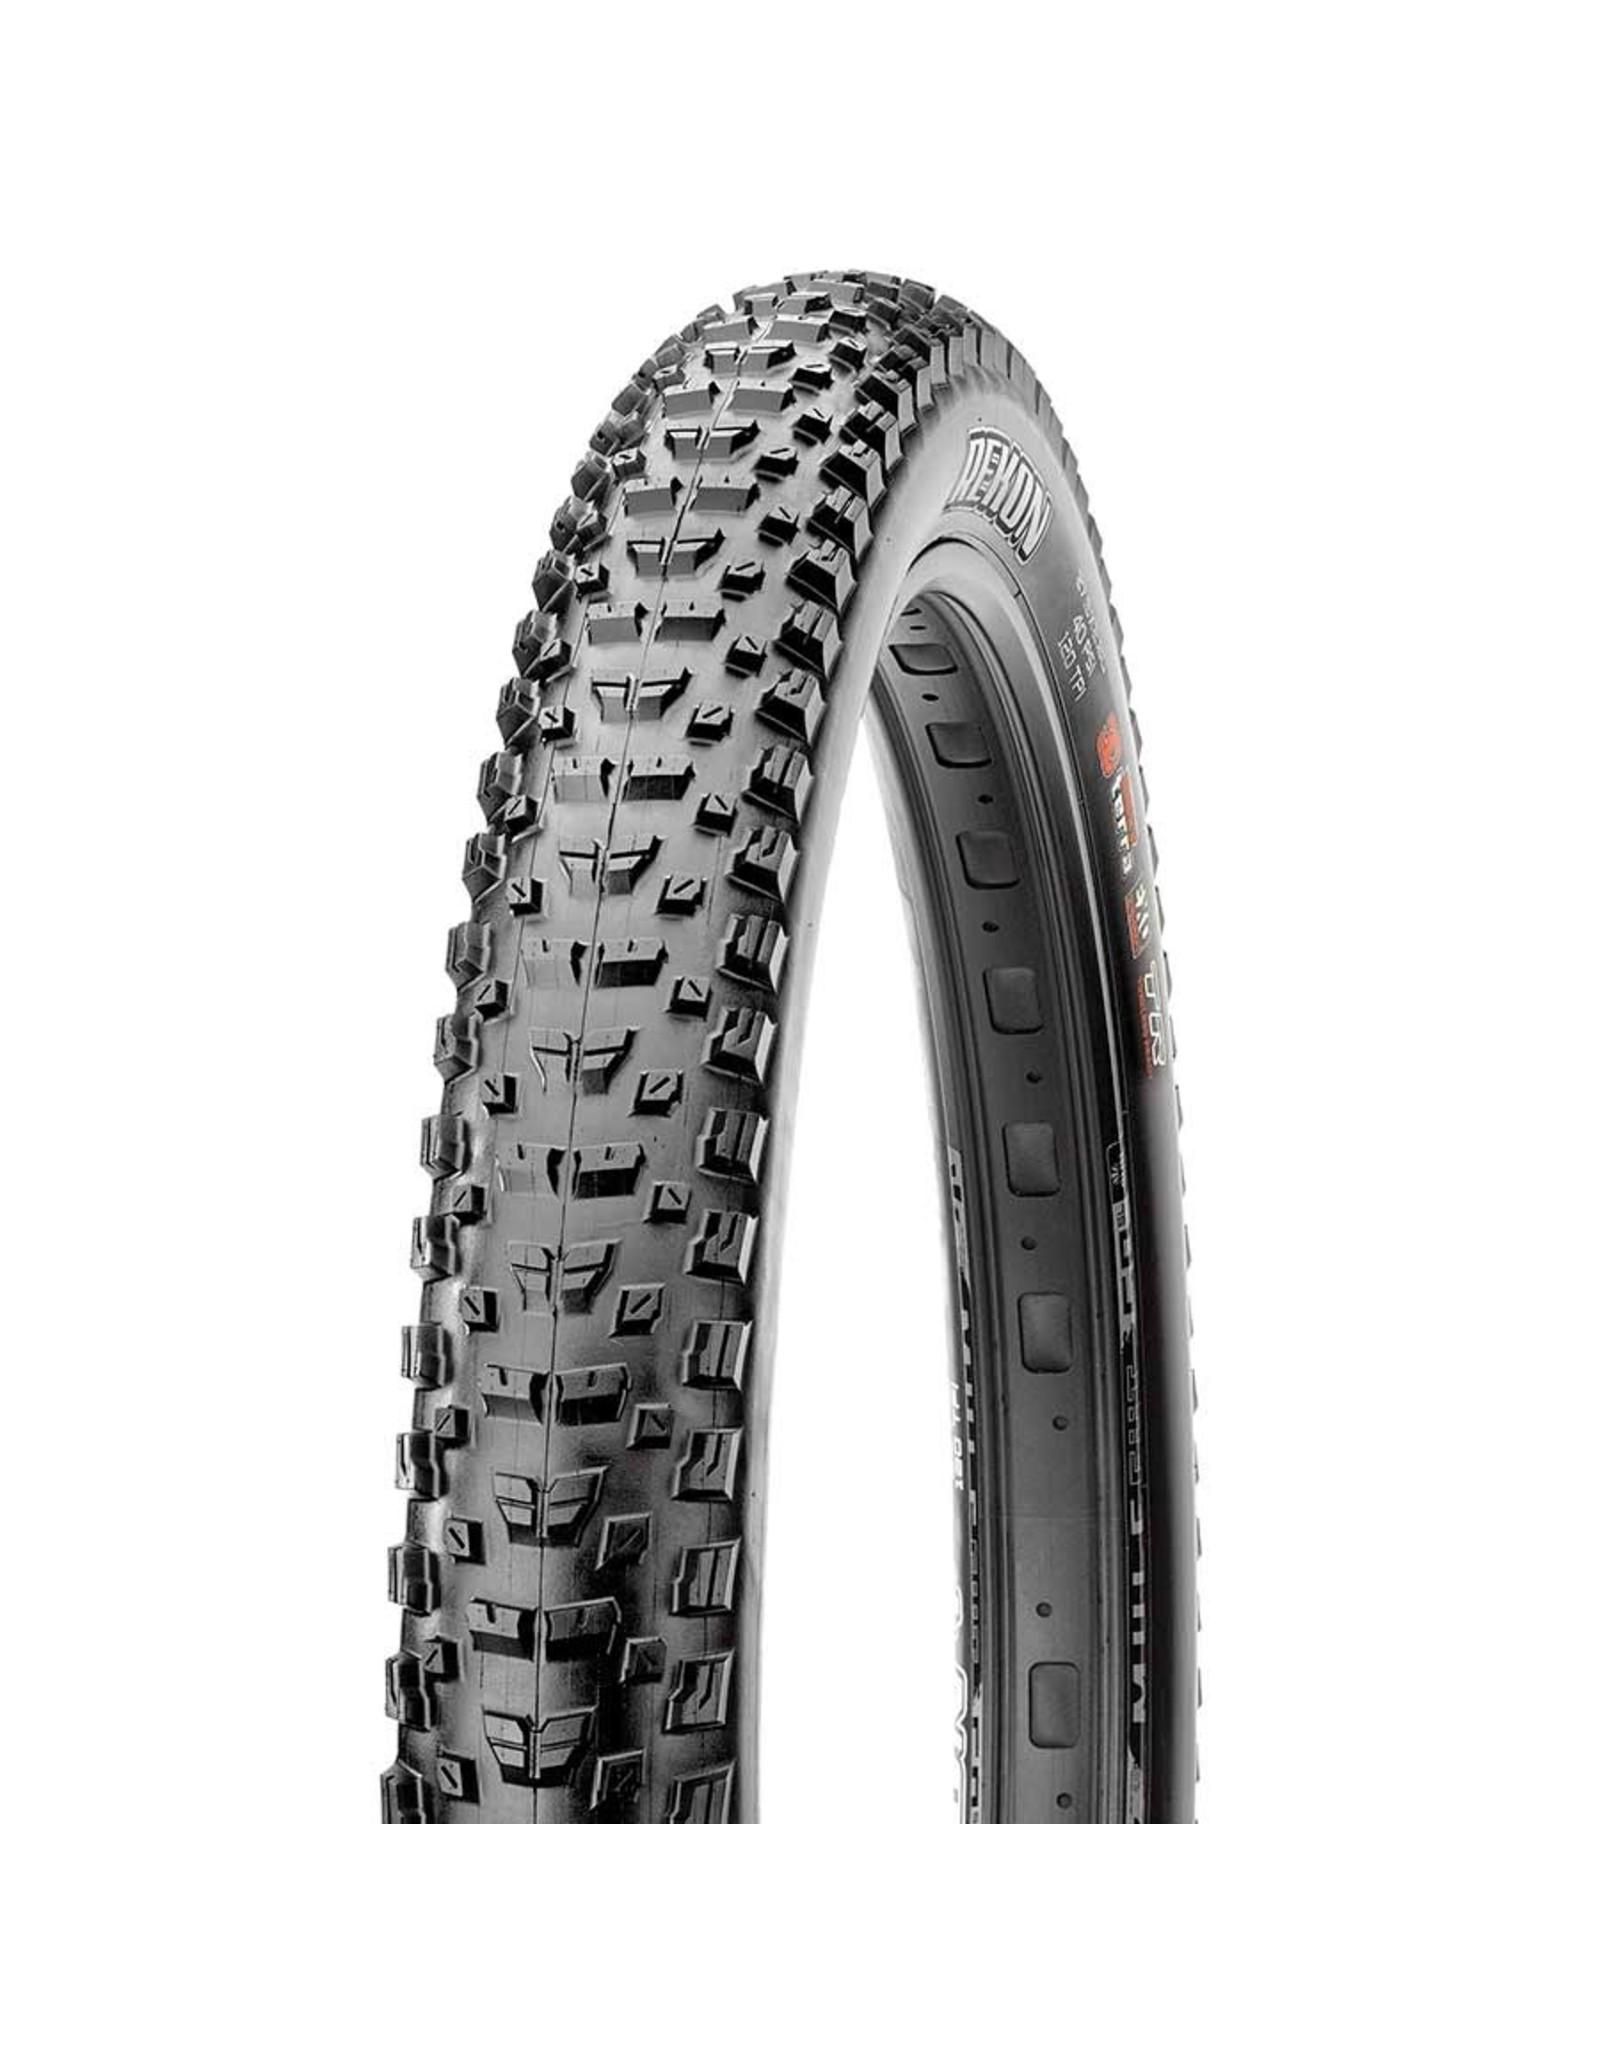 Maxxis Maxxis, Rekon, Tire, 27.5''x2.60, Folding, Tubeless Ready, Dual, EXO, 60TPI, Black